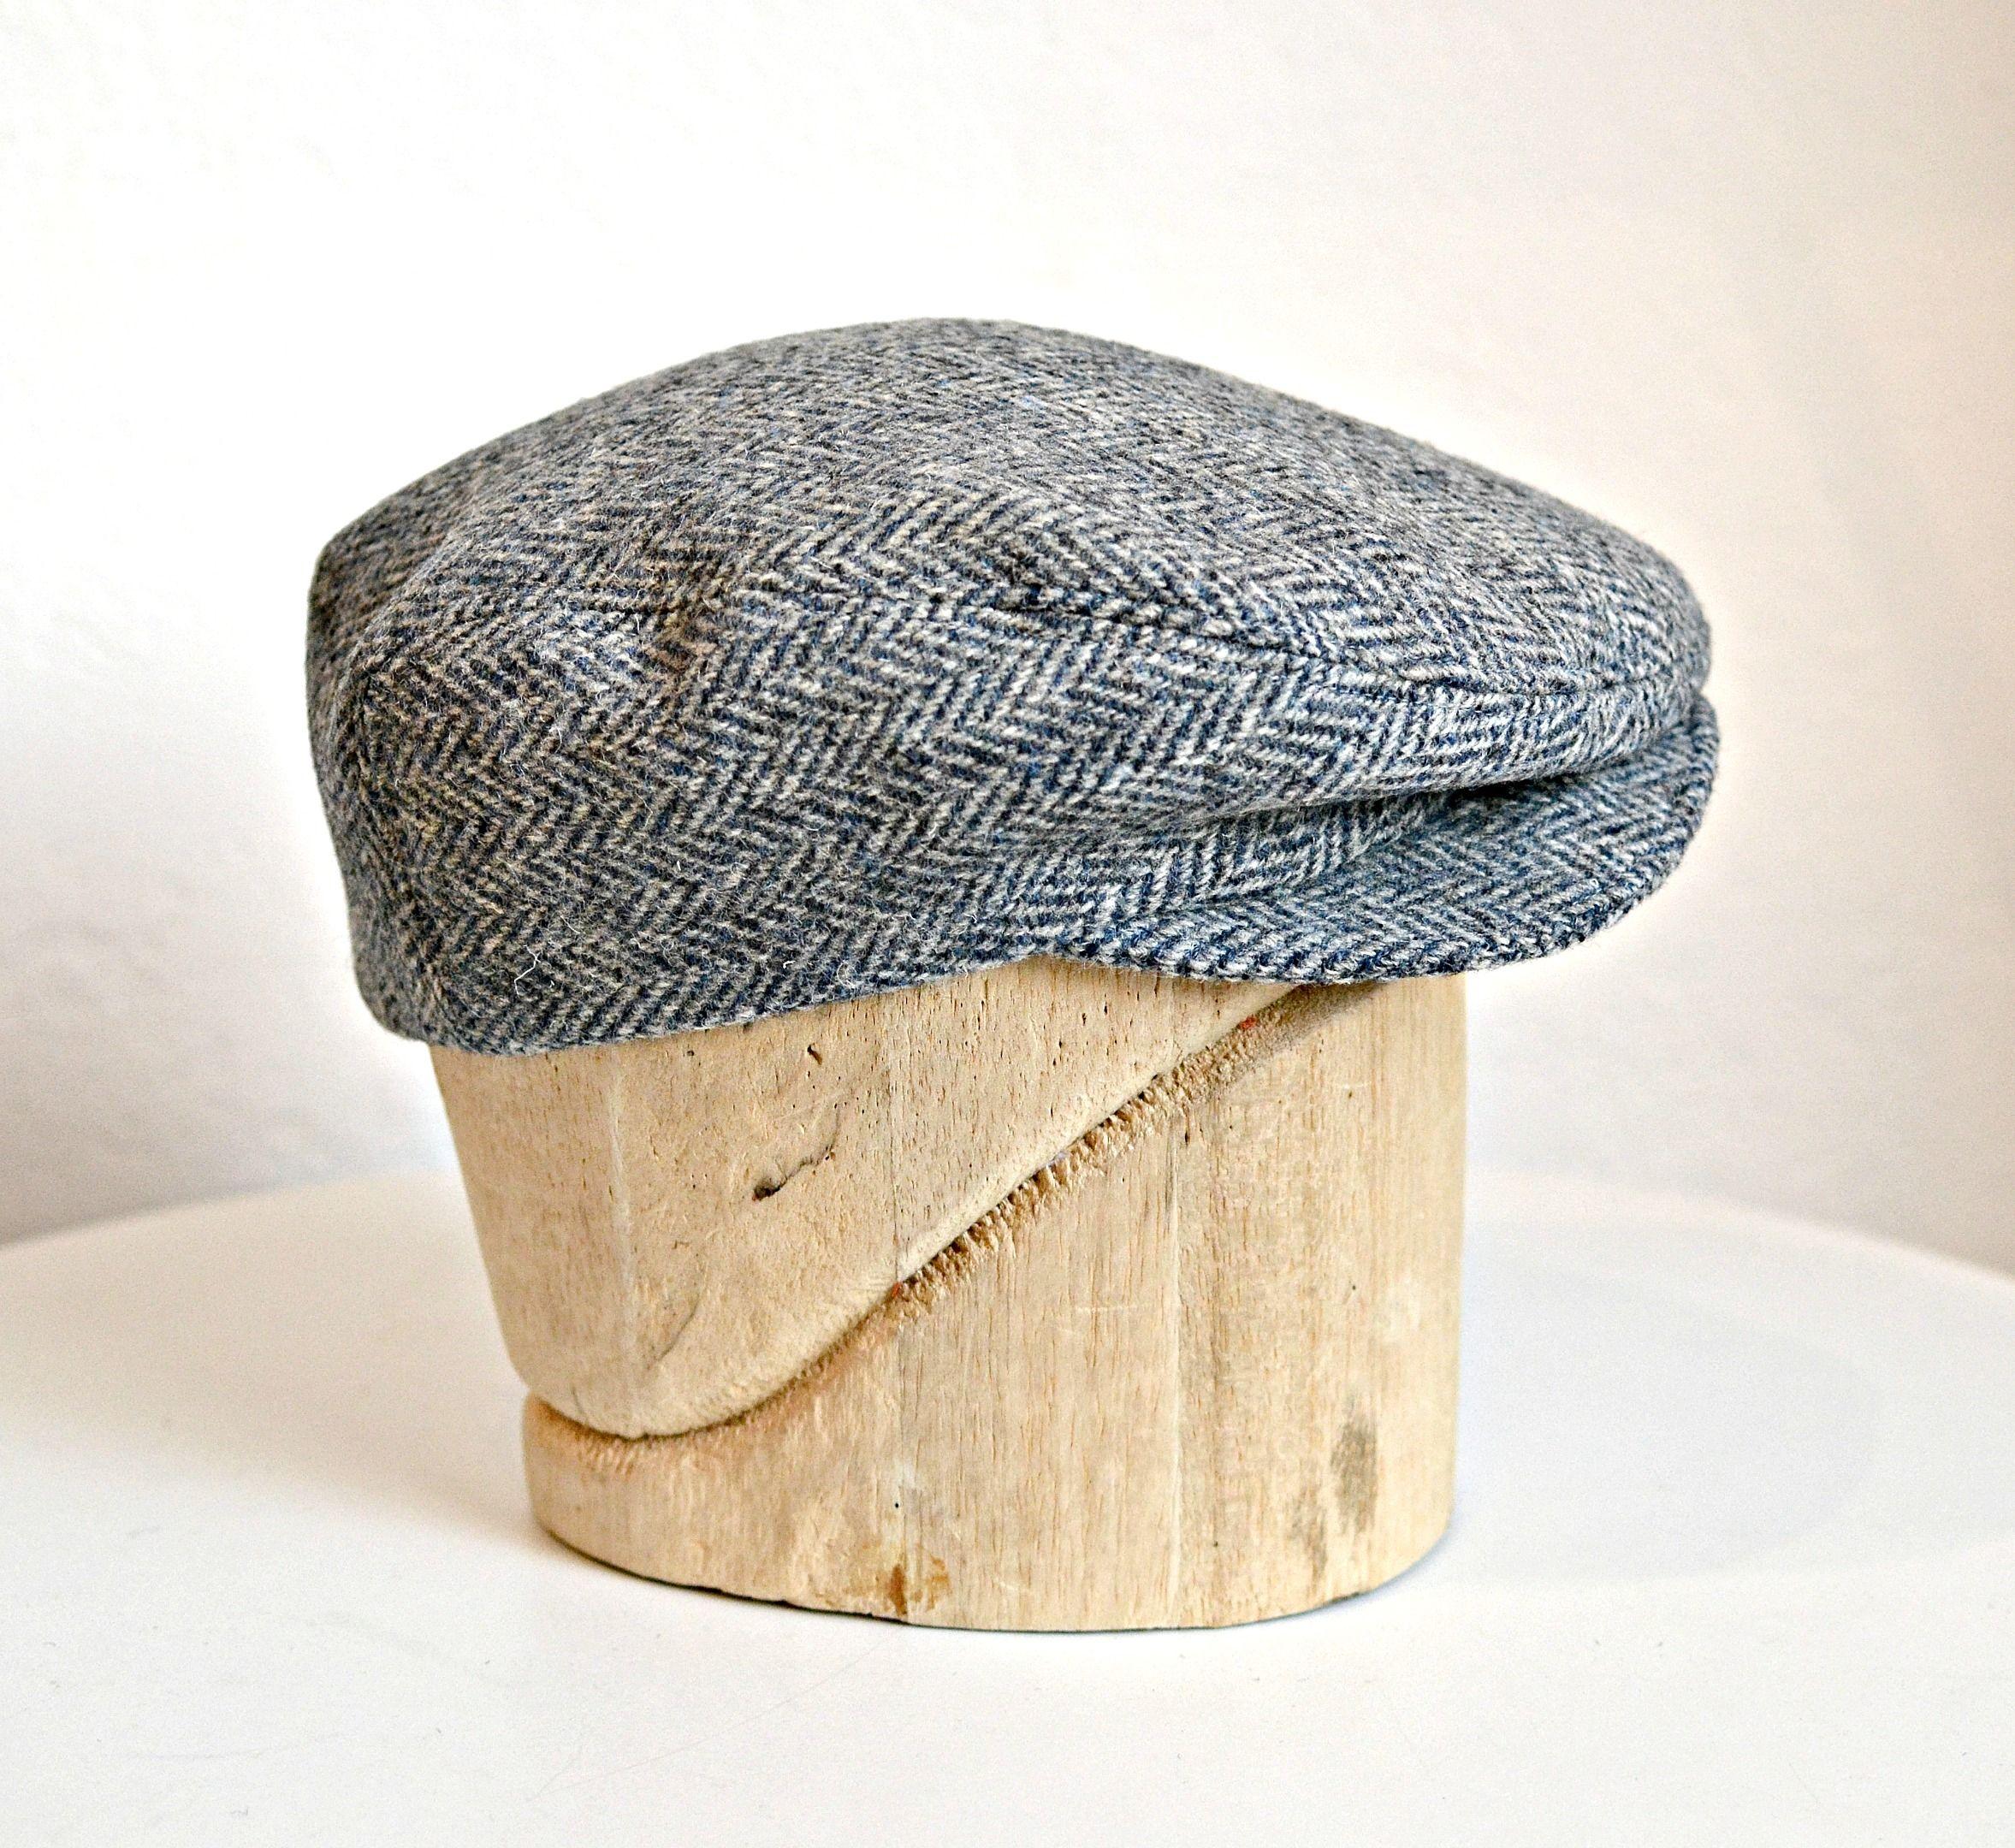 a1e3068ecf6 Men s Driving Cap in Vintage Herringbone Tweed - Flat Cap ...